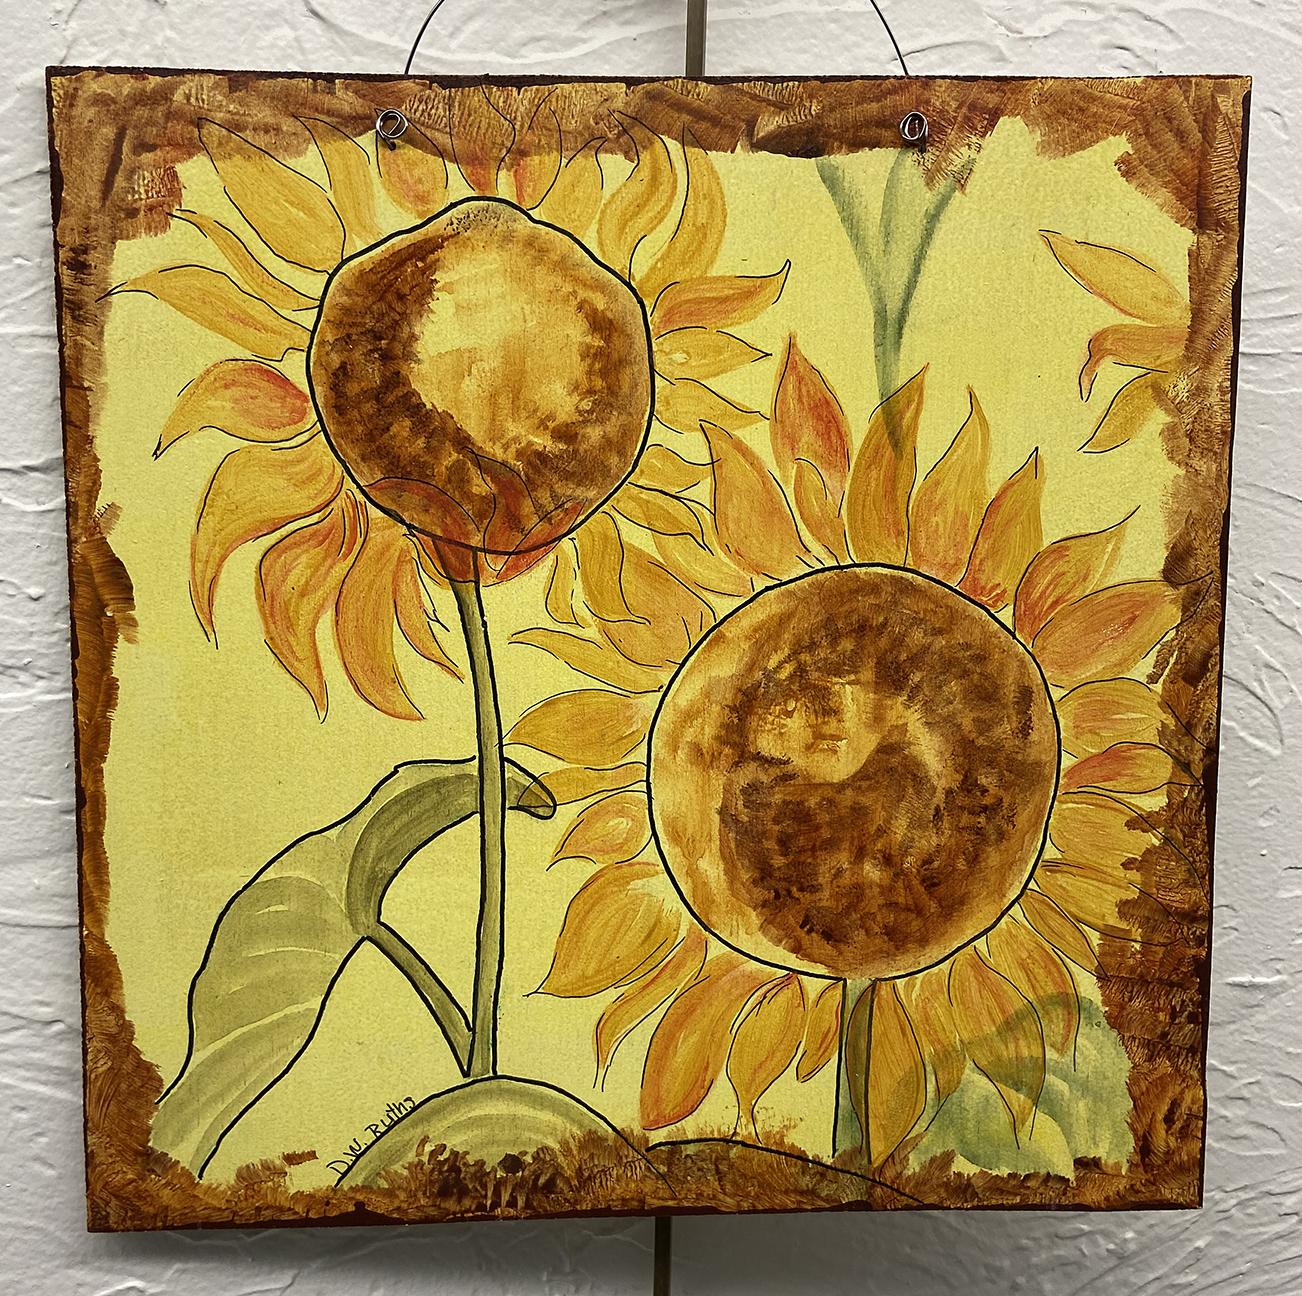 #5 Sunflowers, Deb Ruths, Acrylic on Wood (10 x 10), $15.00 suggested minimum bid  (47 meals)